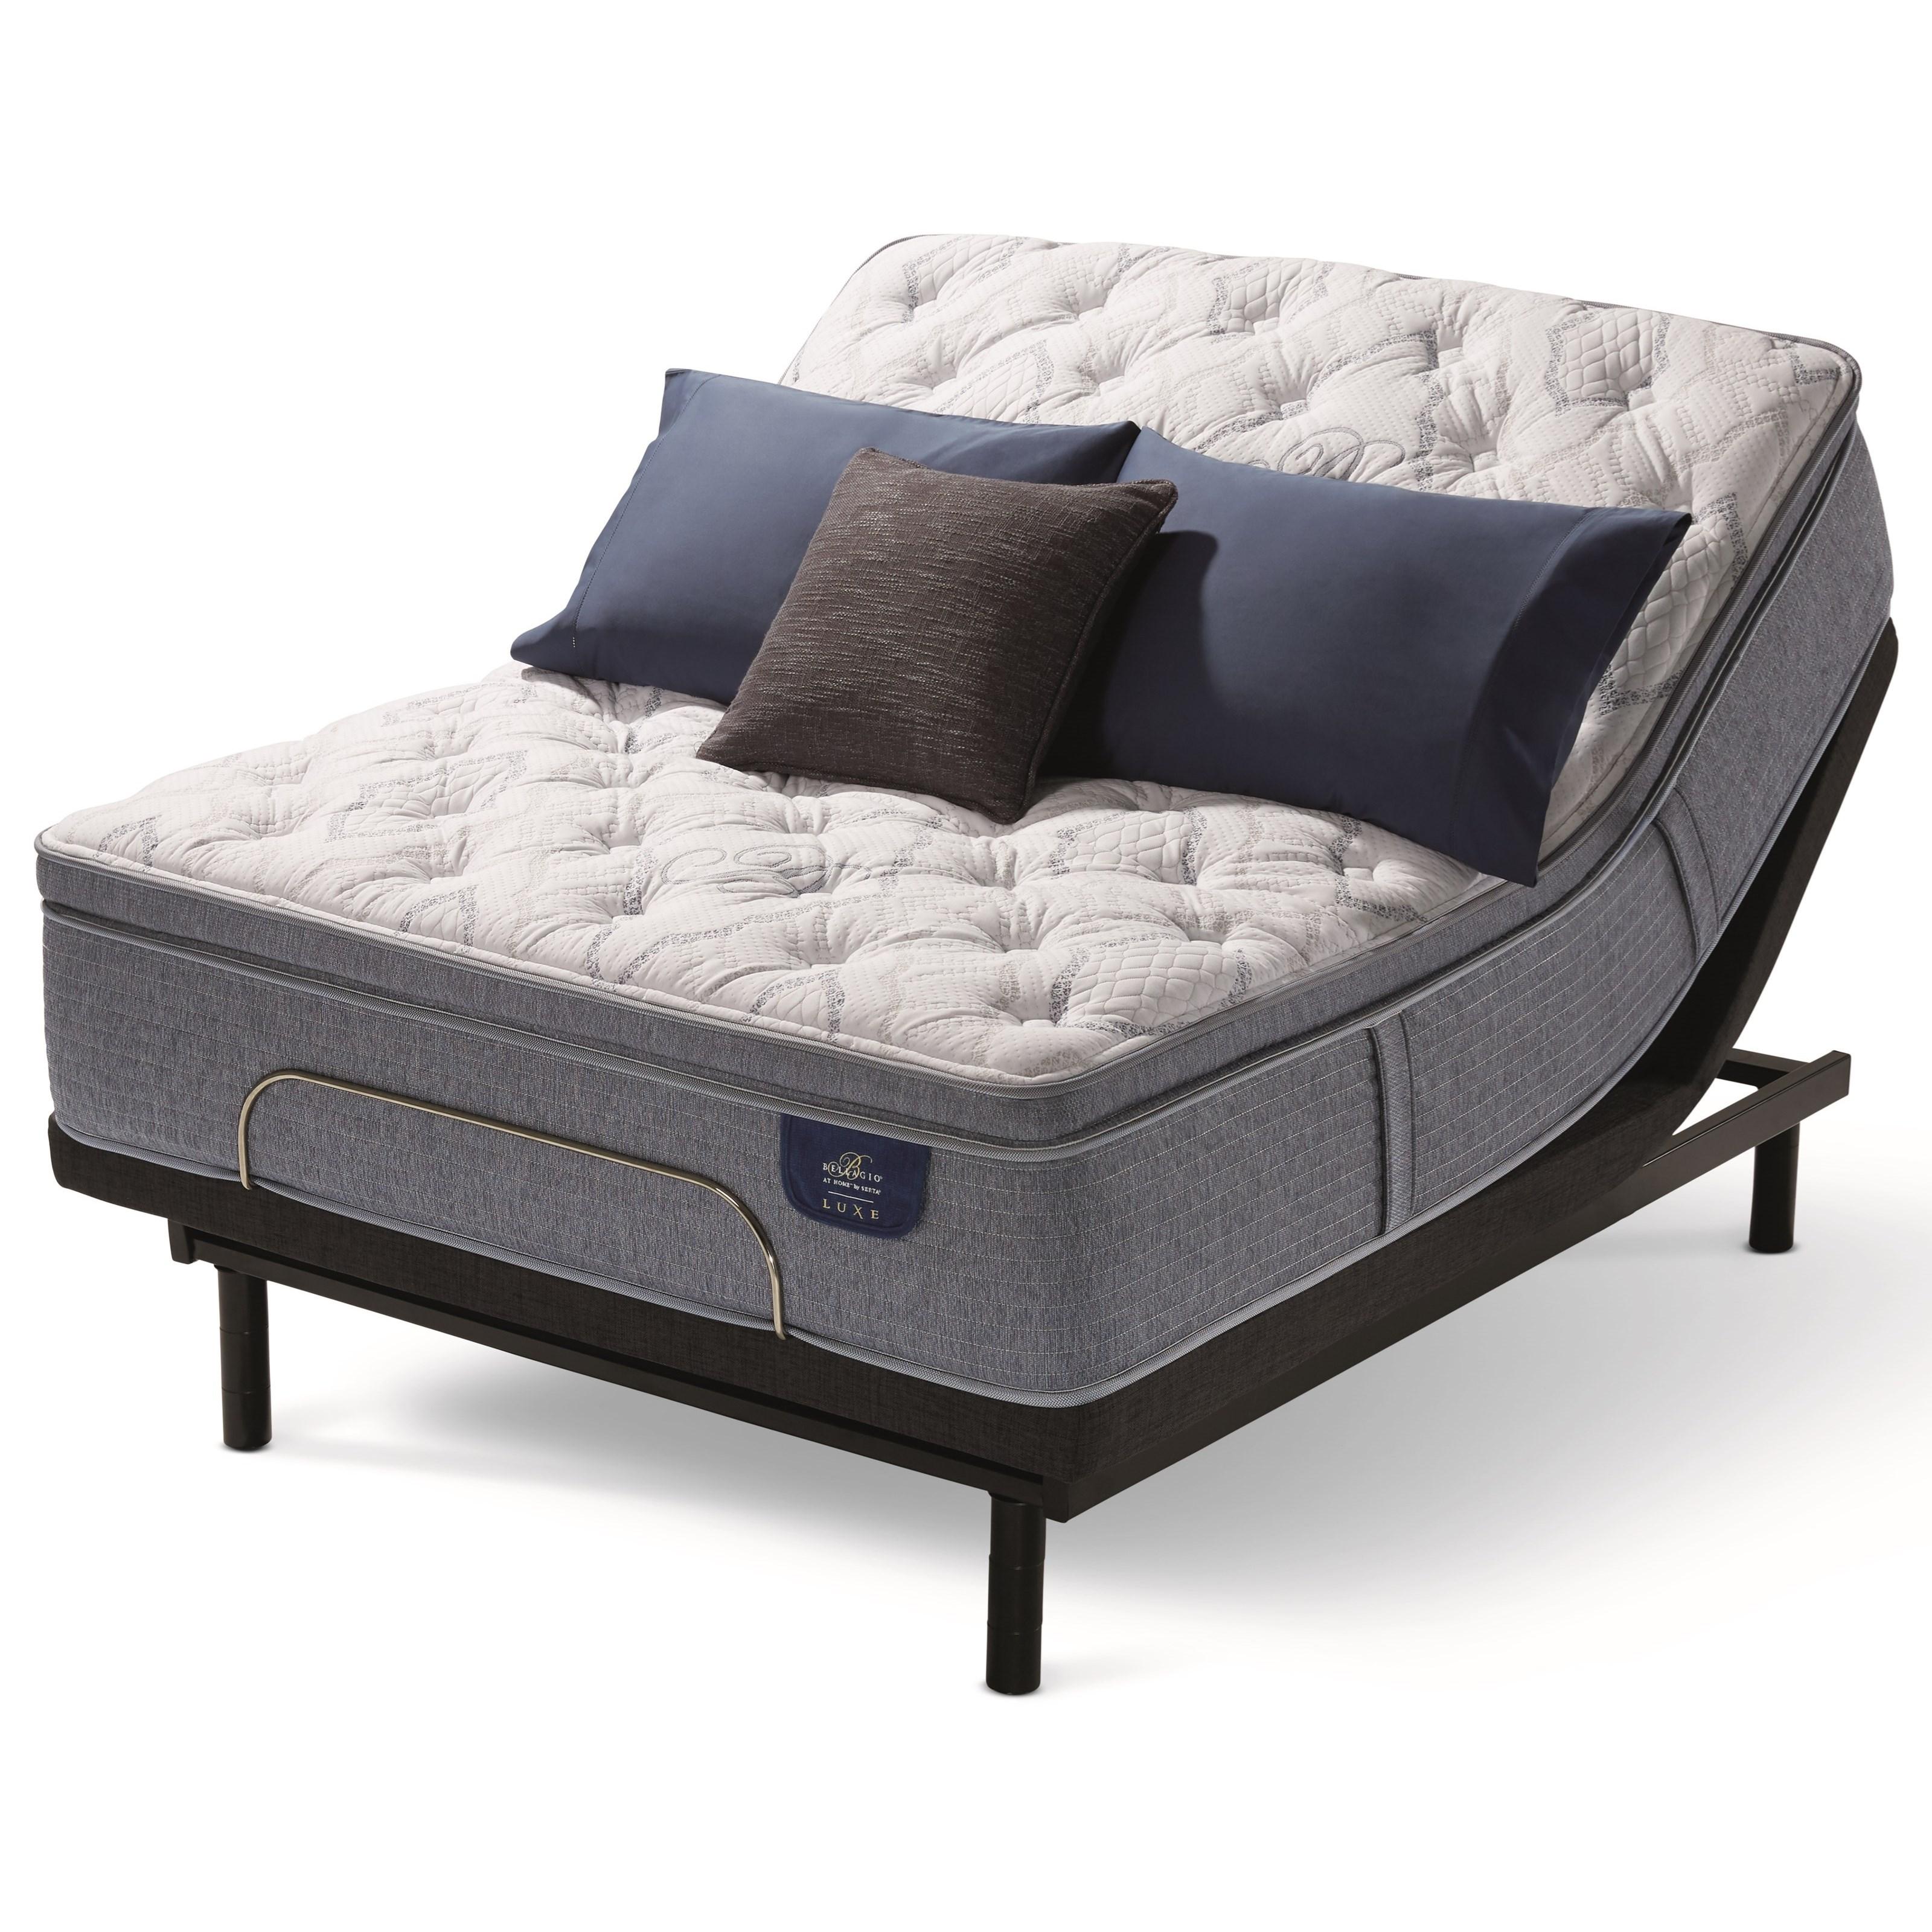 Bellagio Grandezza Luxury Firm PT Twin XL Luxury Firm PT Hybrid Adj Set by Serta at Adcock Furniture